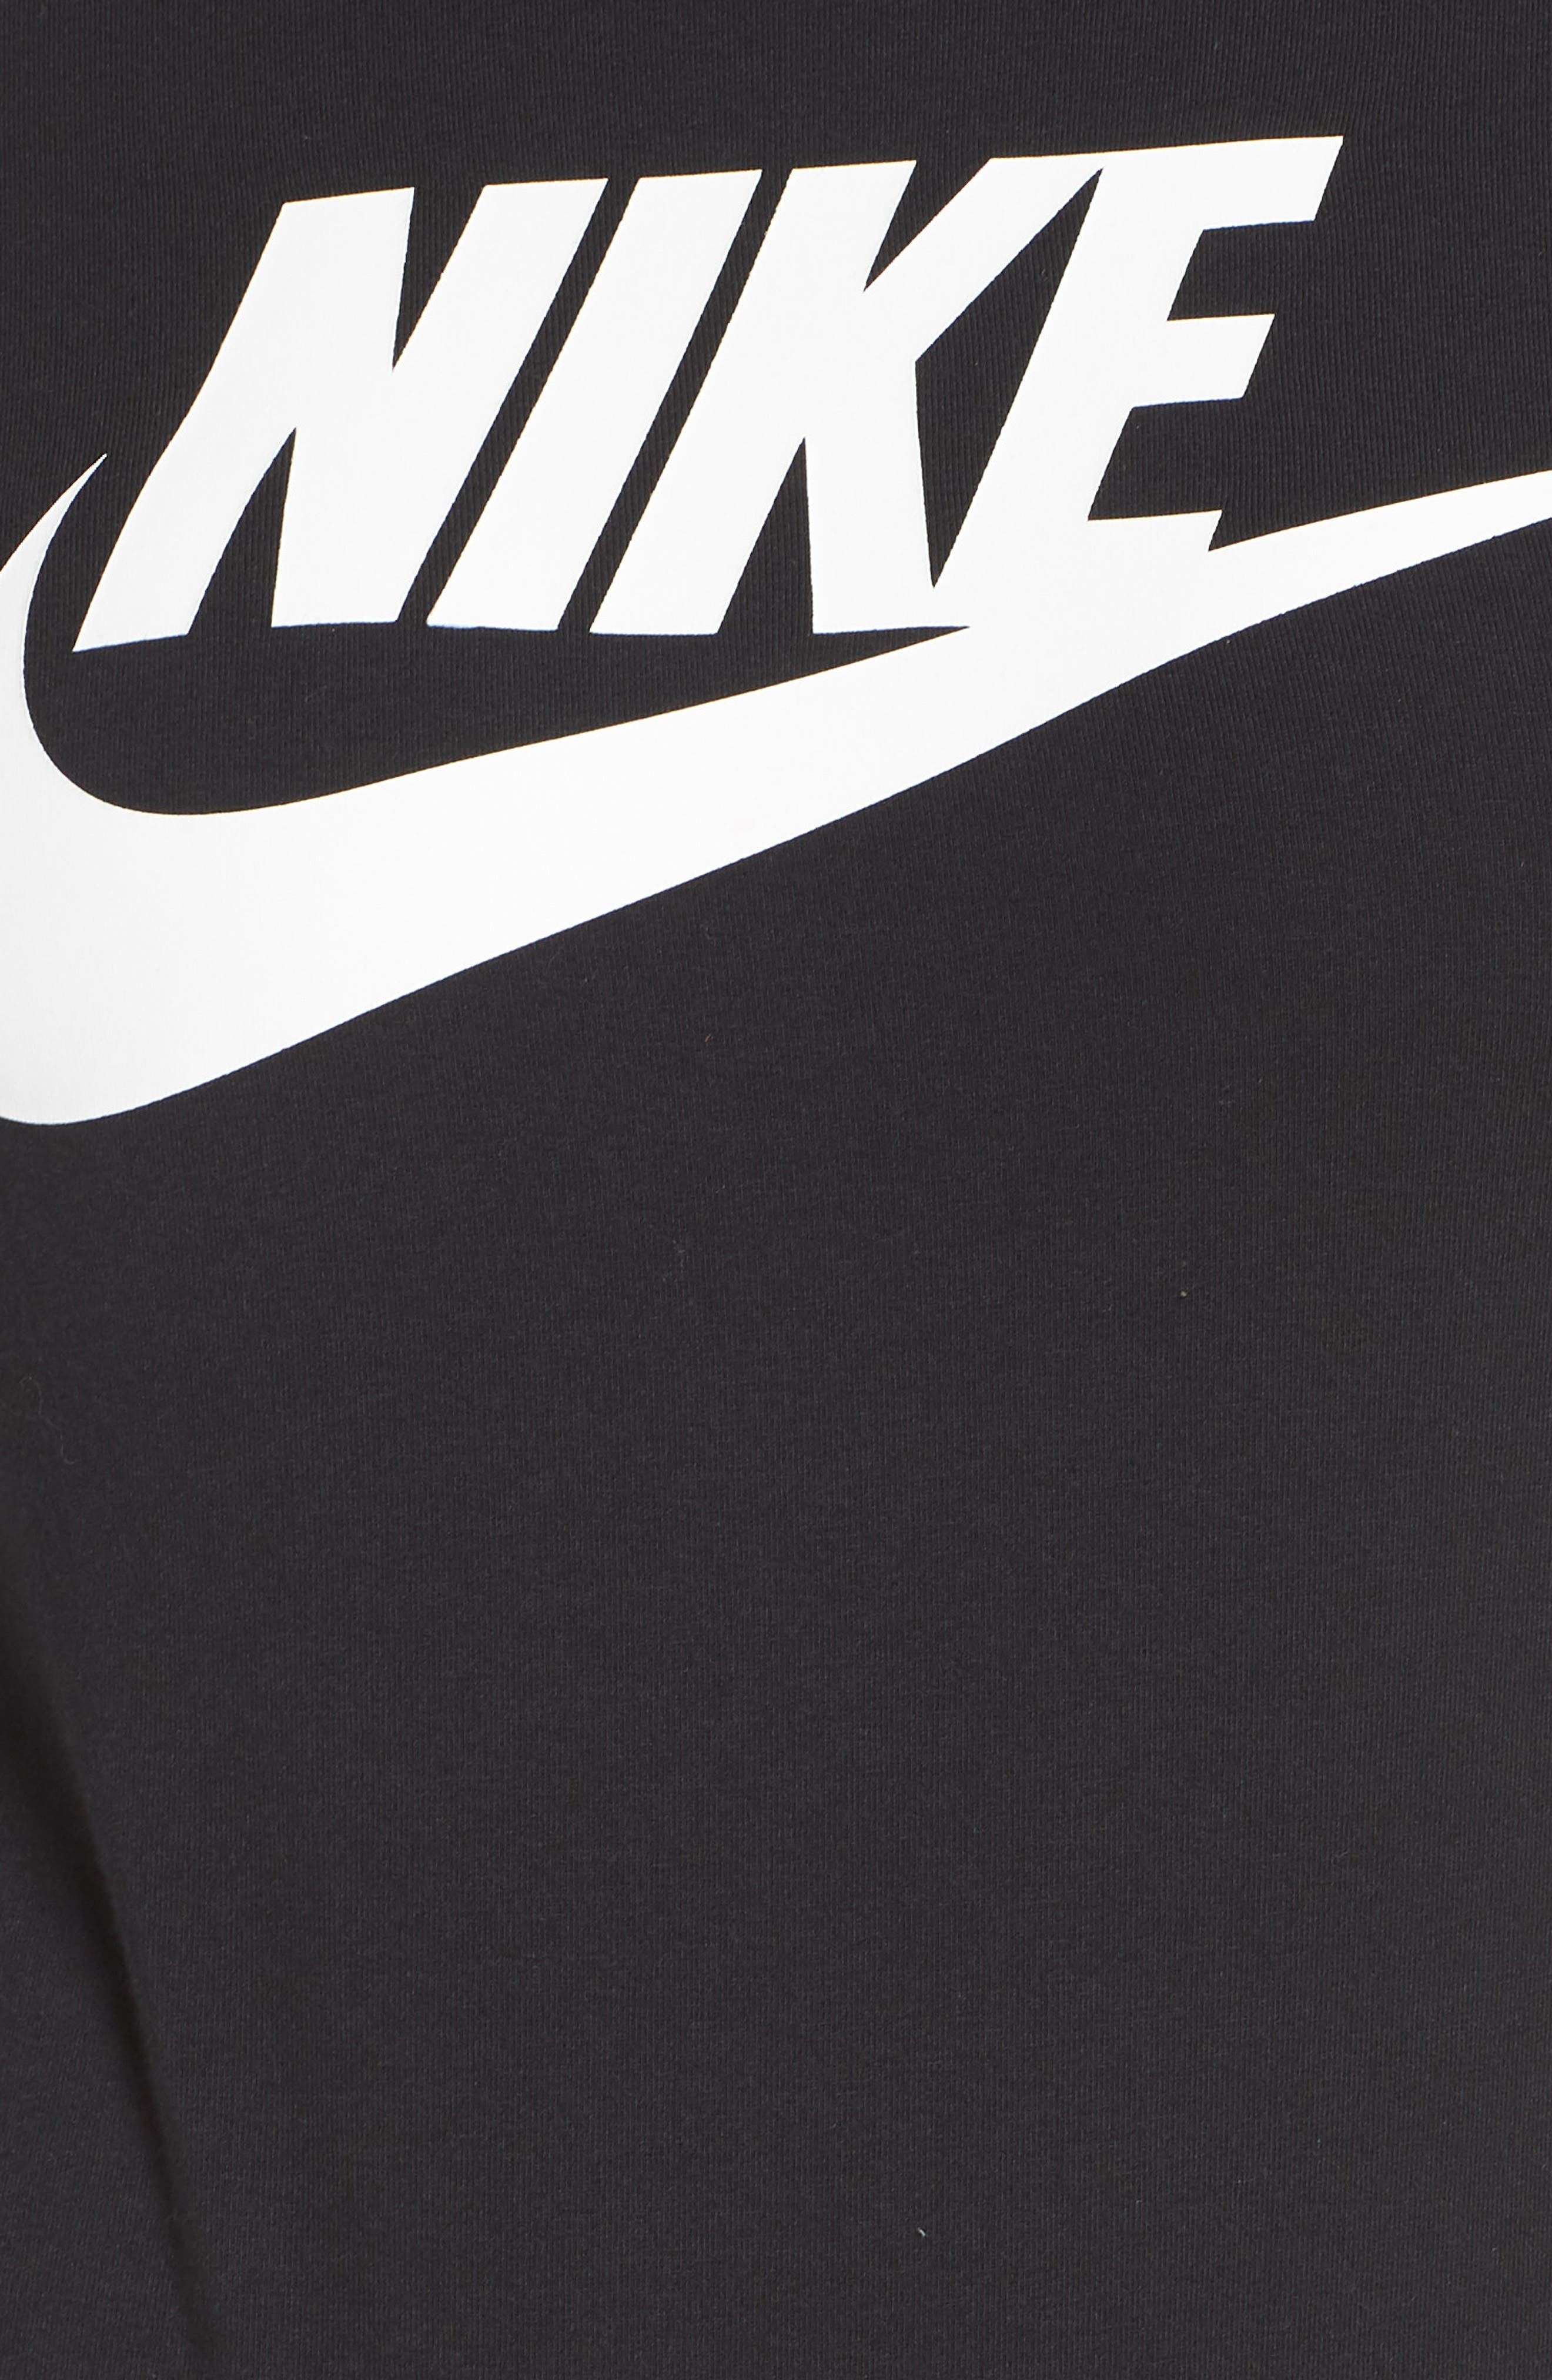 NSW Essential Bodysuit,                             Alternate thumbnail 6, color,                             BLACK/ BLACK/ WHITE